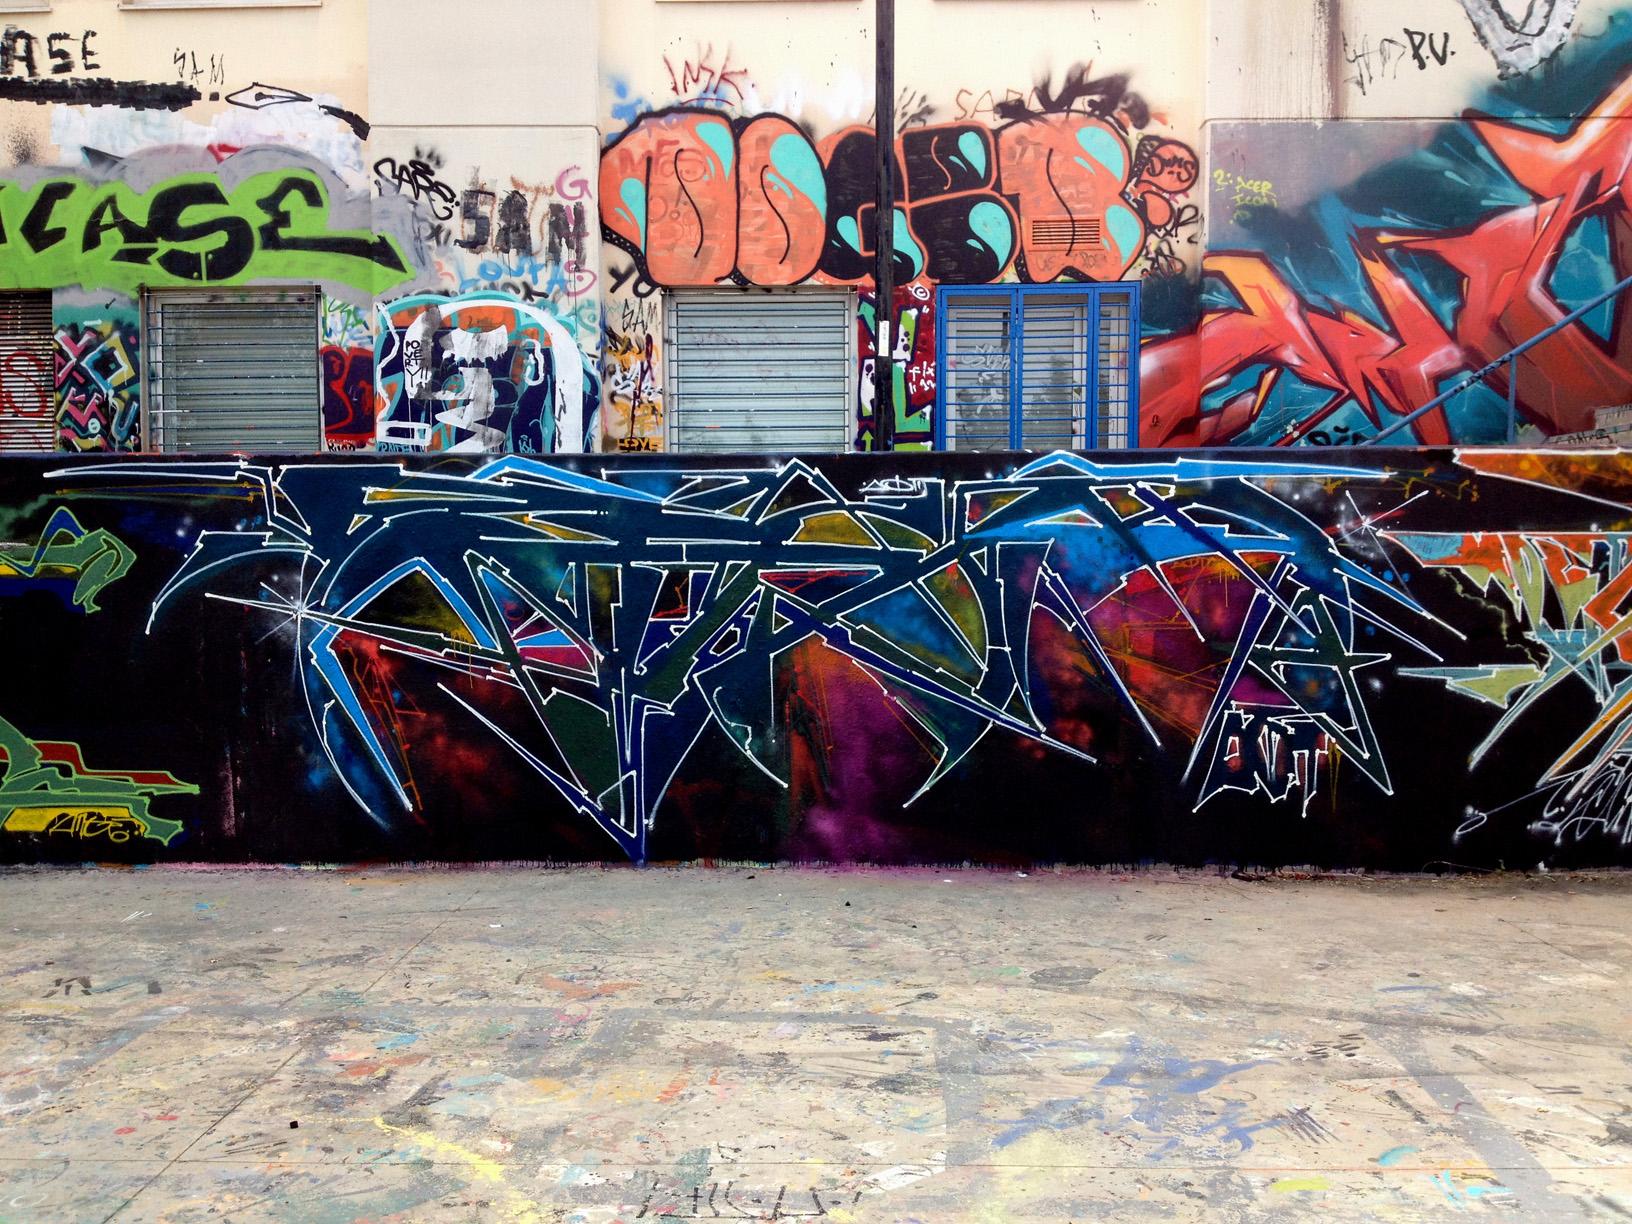 Bios Athens 2